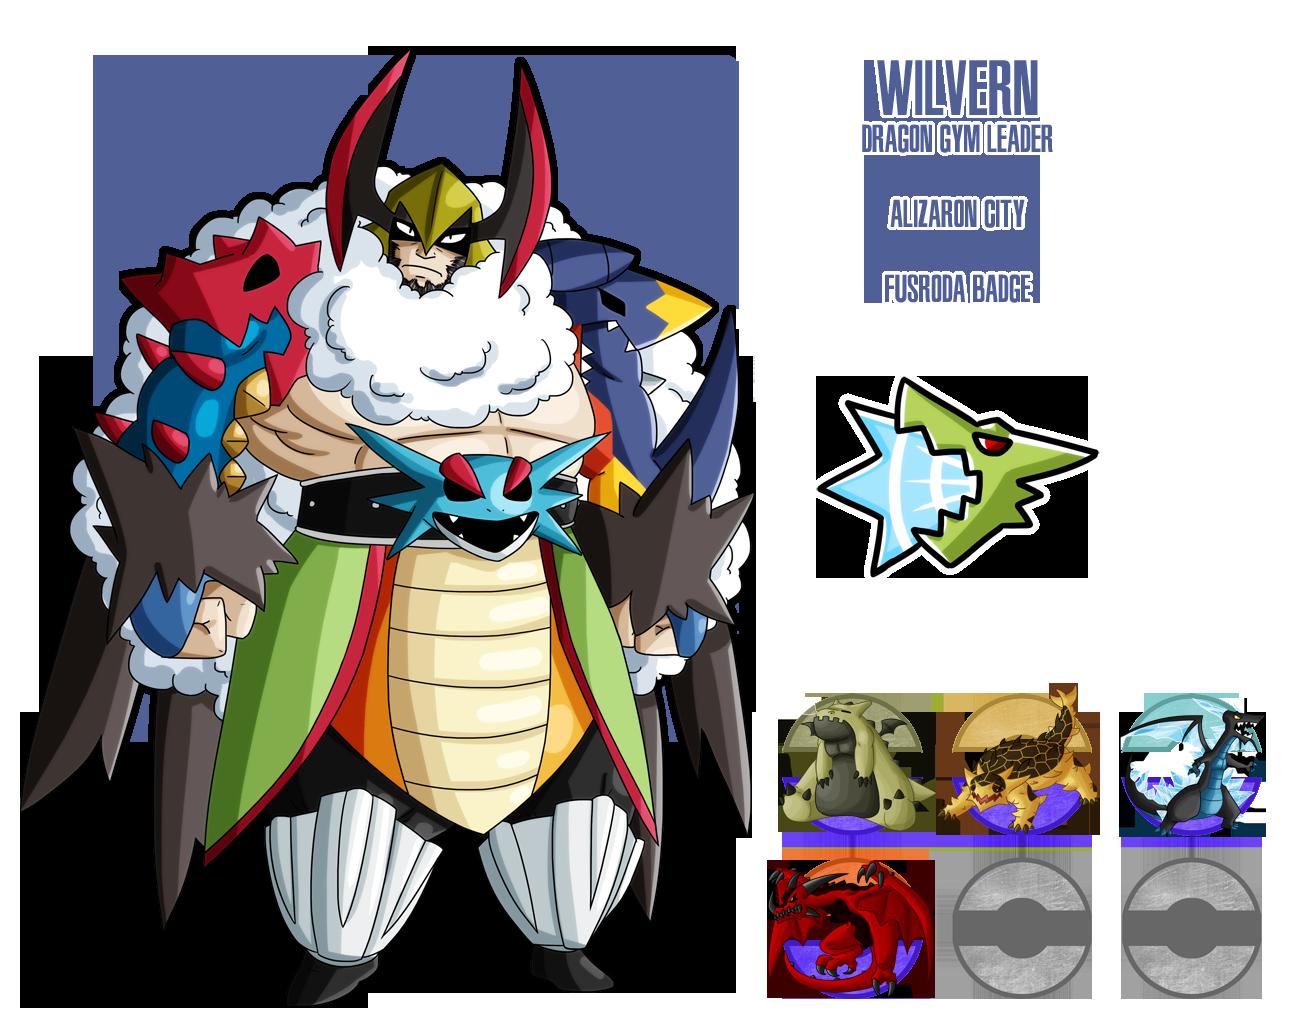 fakemon dragon gym leader by drcrafty on deviantart